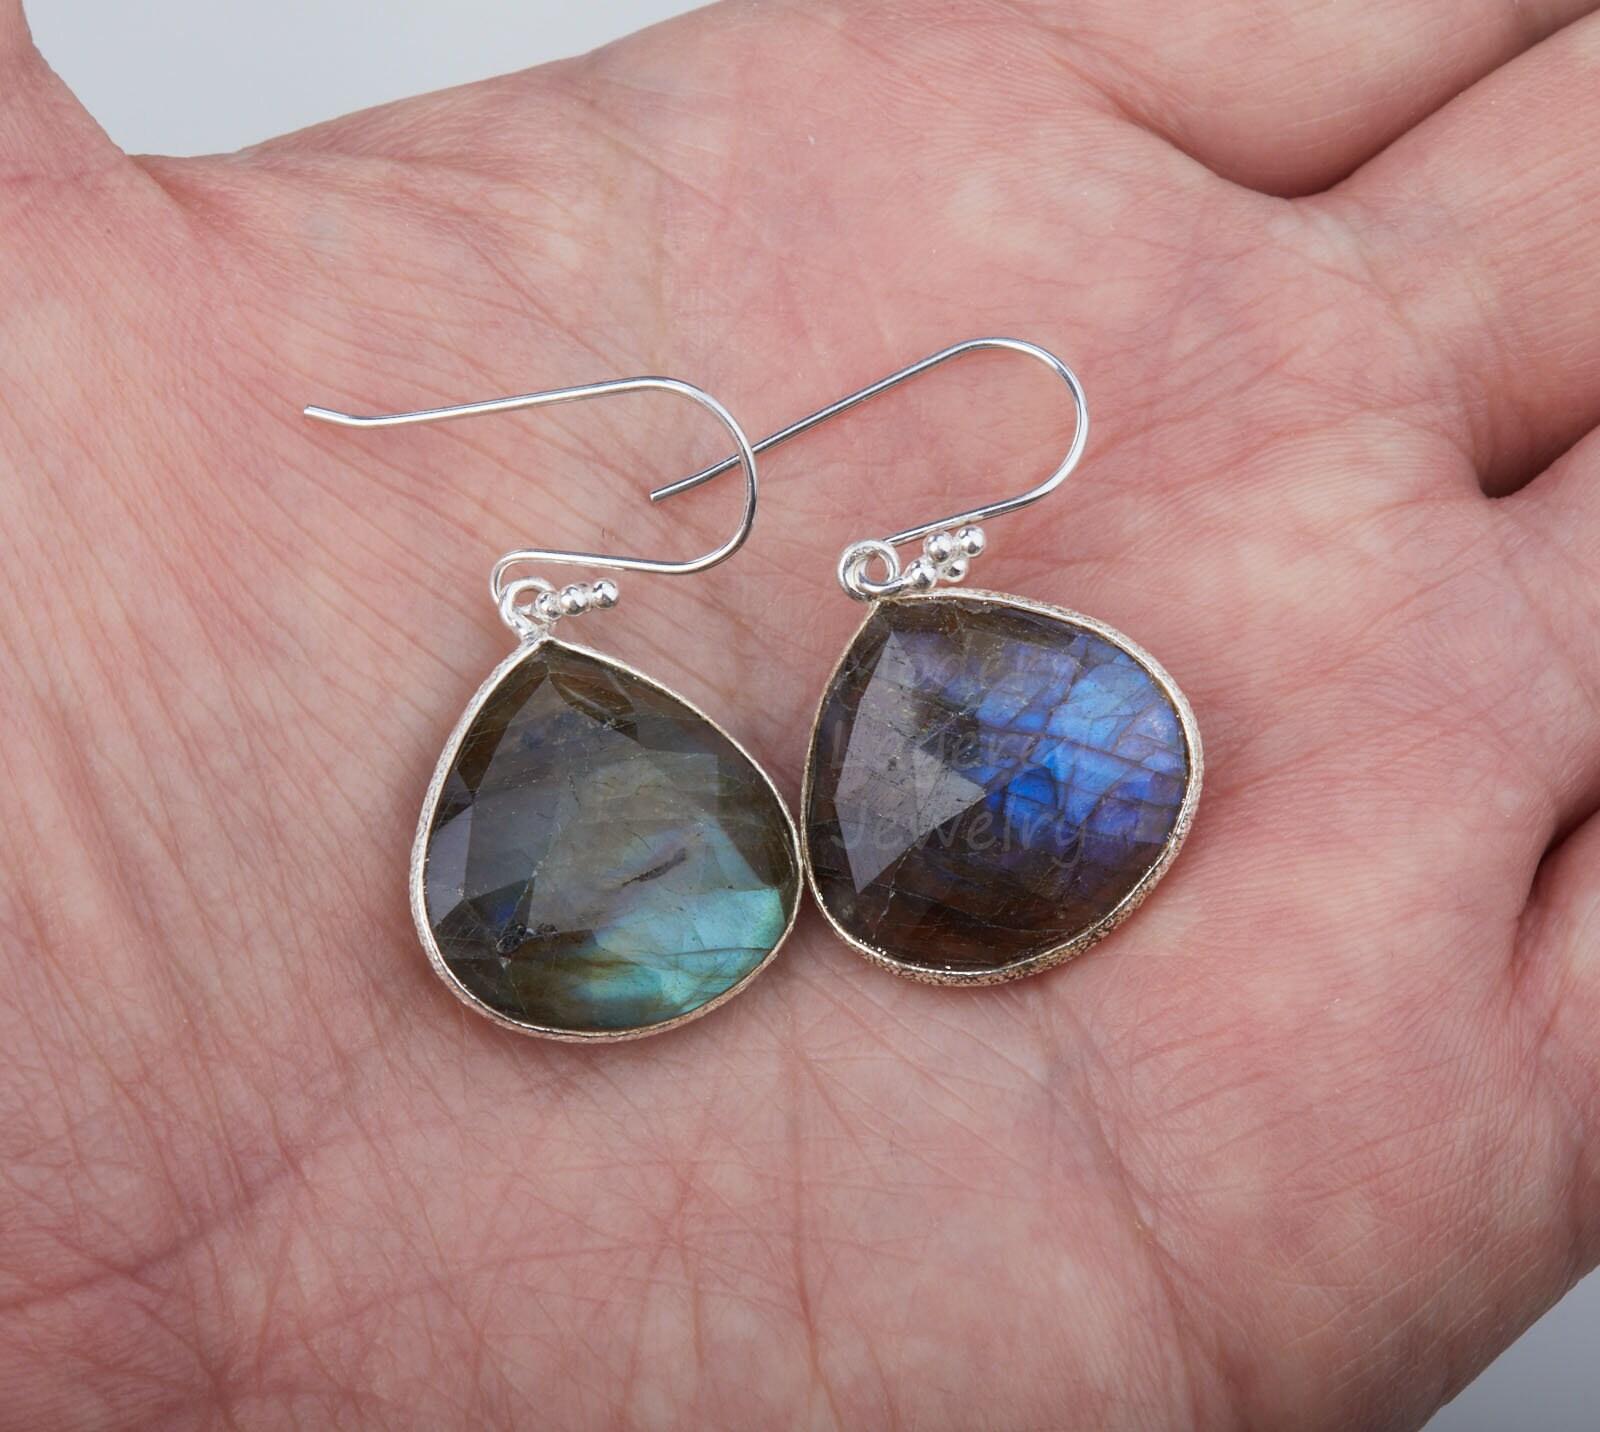 Earring For Her Labradorite Earring Earring For Women| Silver Oxidize Earring Gift For Her Gemstone Earring GFS3160 Brass Earring